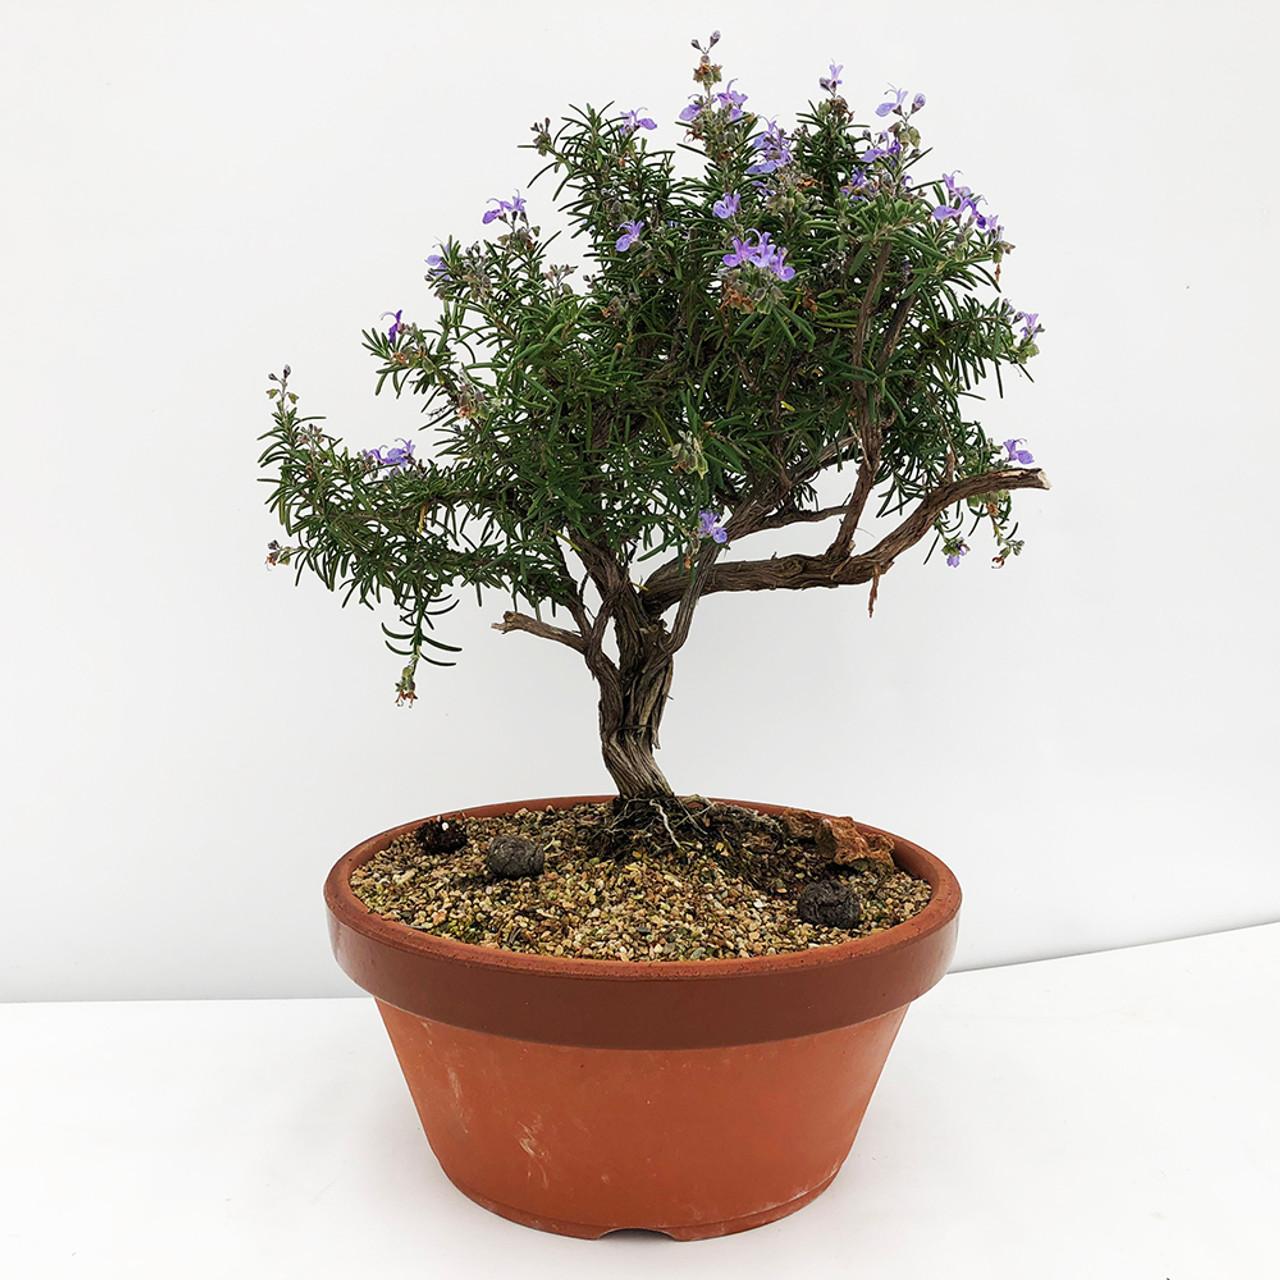 Single Trunk Rosemary Bonsai Tree I Bonsai Outlet